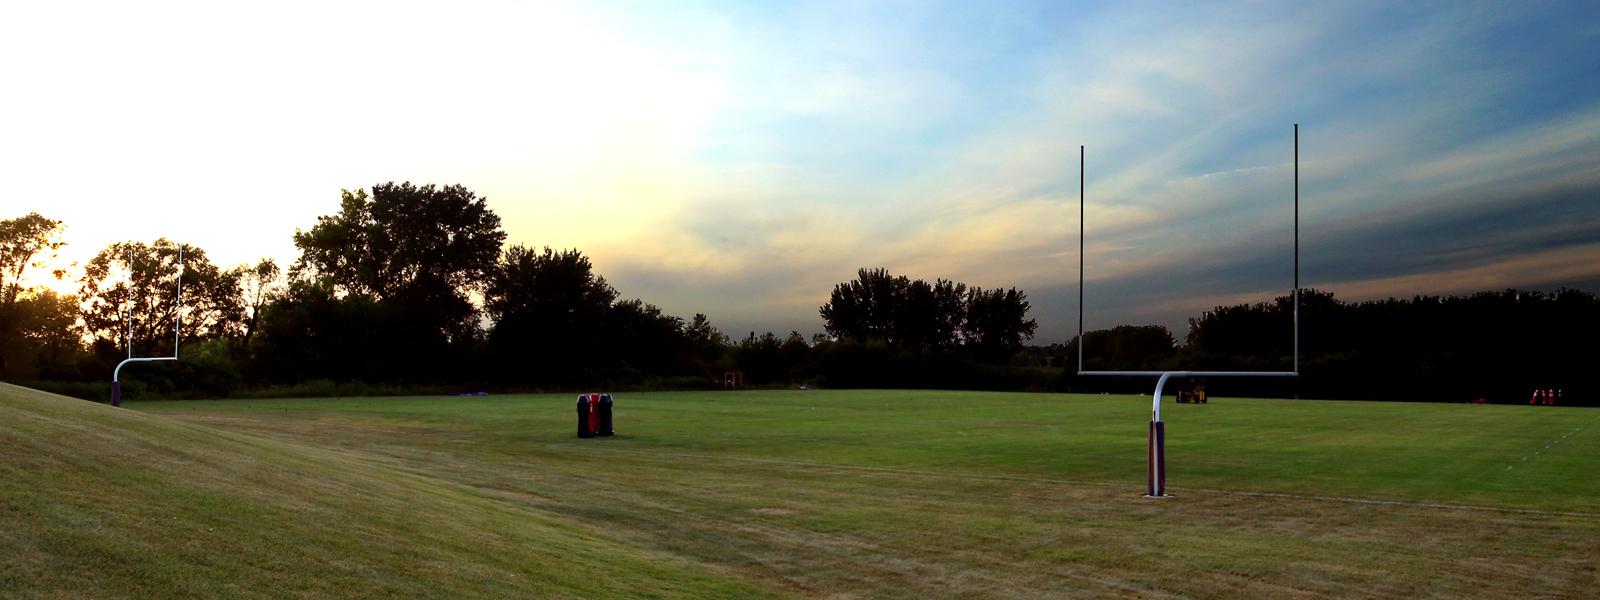 UNI's Outdoor Football Pracitce Facility